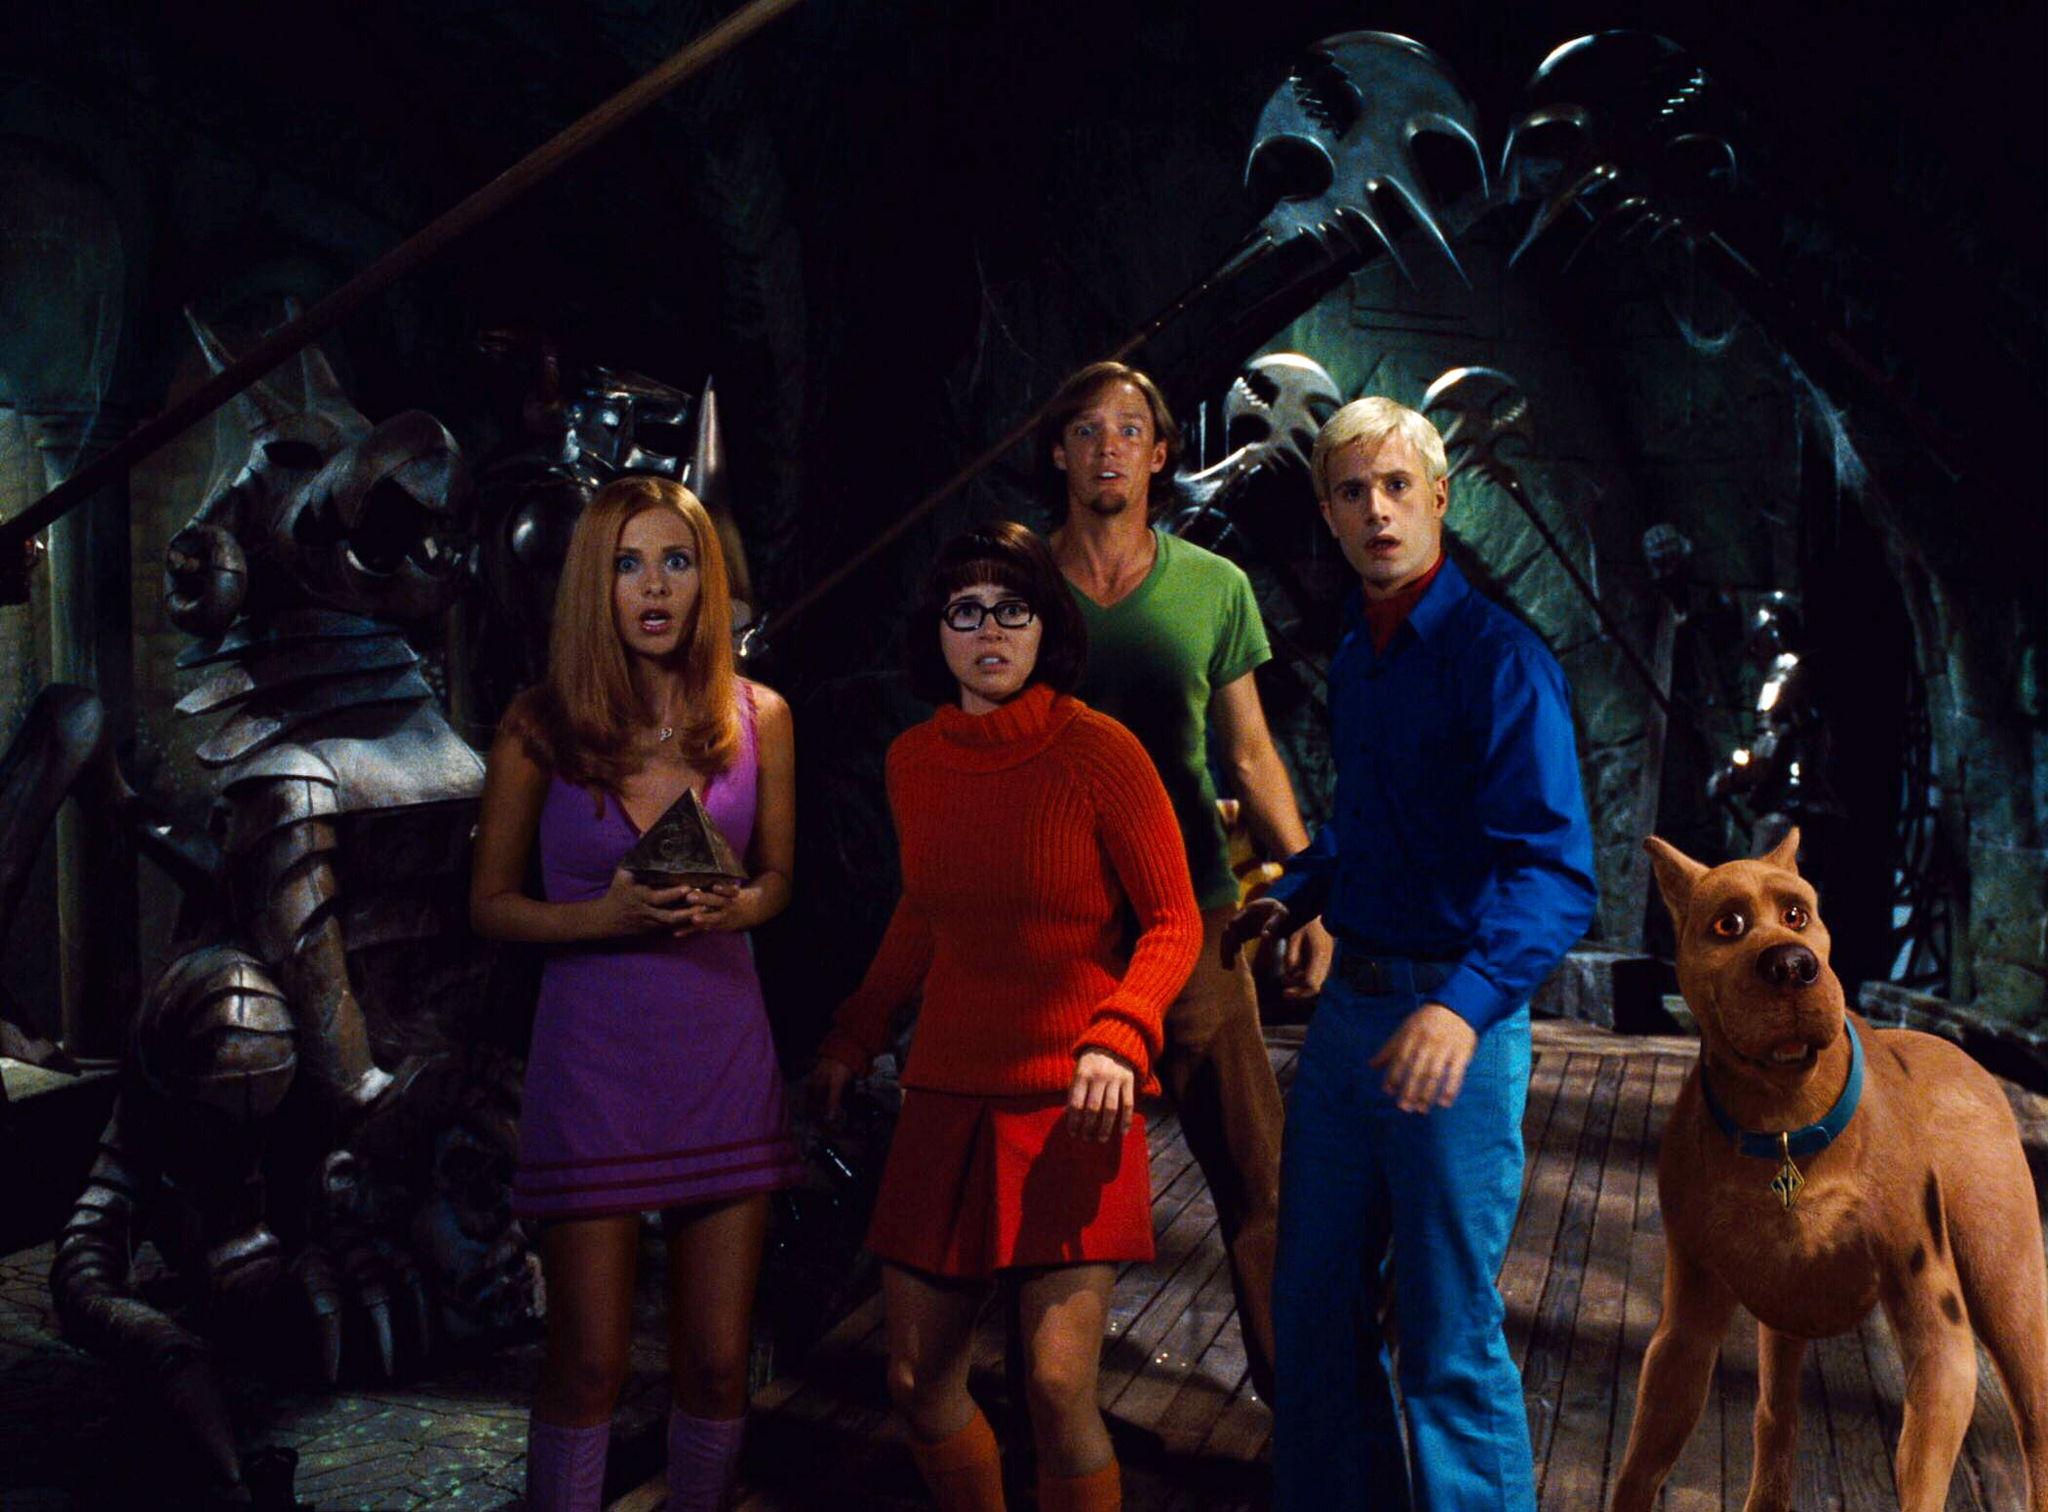 Matthew Lillard, Sarah Michelle Gellar, Linda Cardellini, Freddie Prinze Jr., and Neil Fanning in Scooby-Doo (2002)